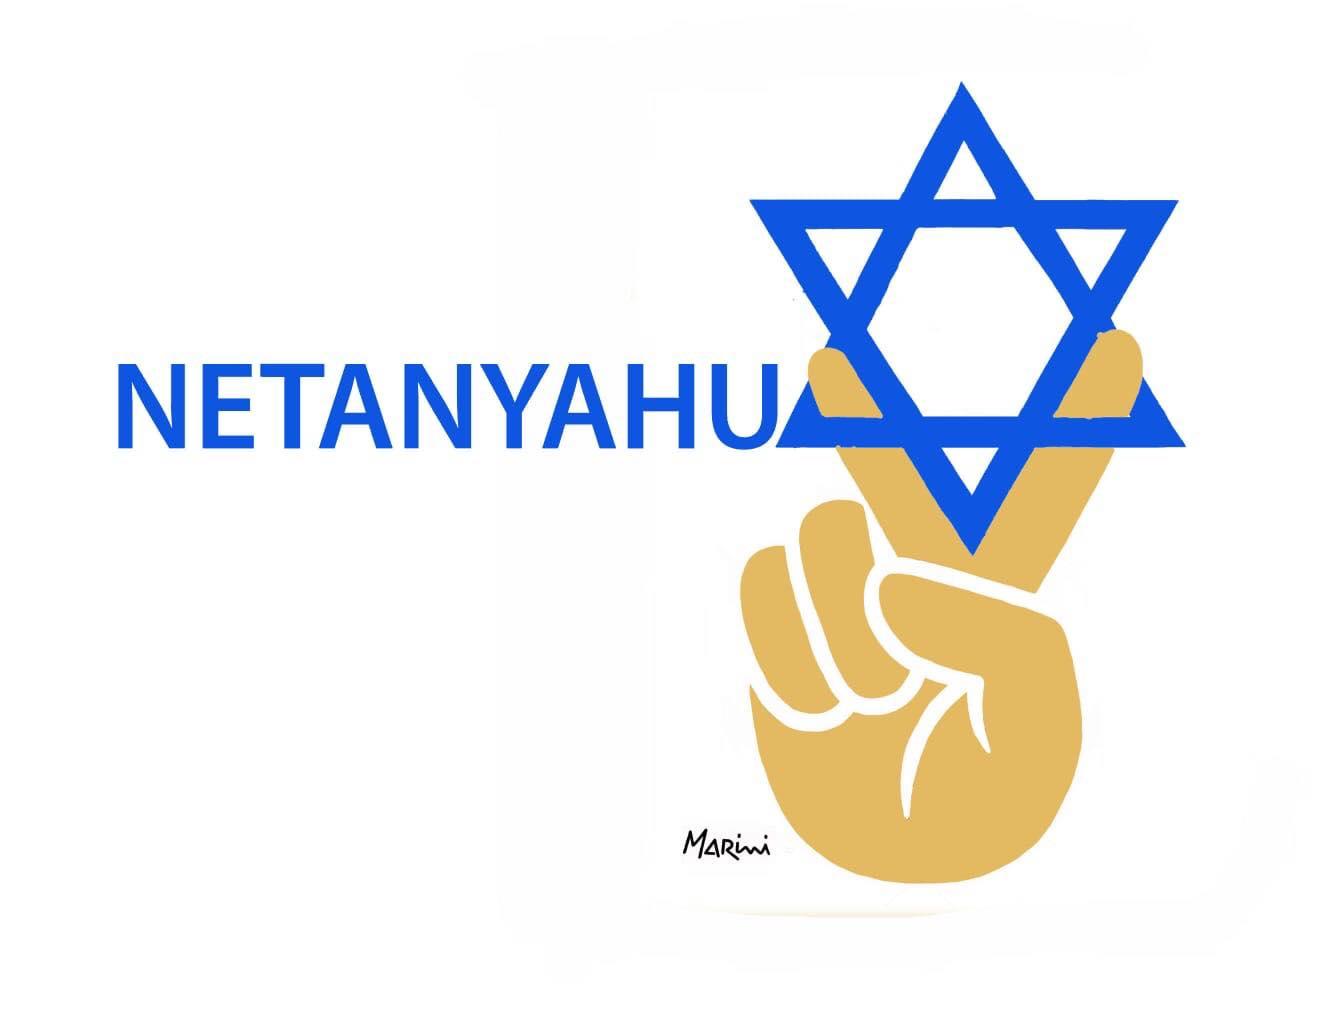 elezioni israele marini